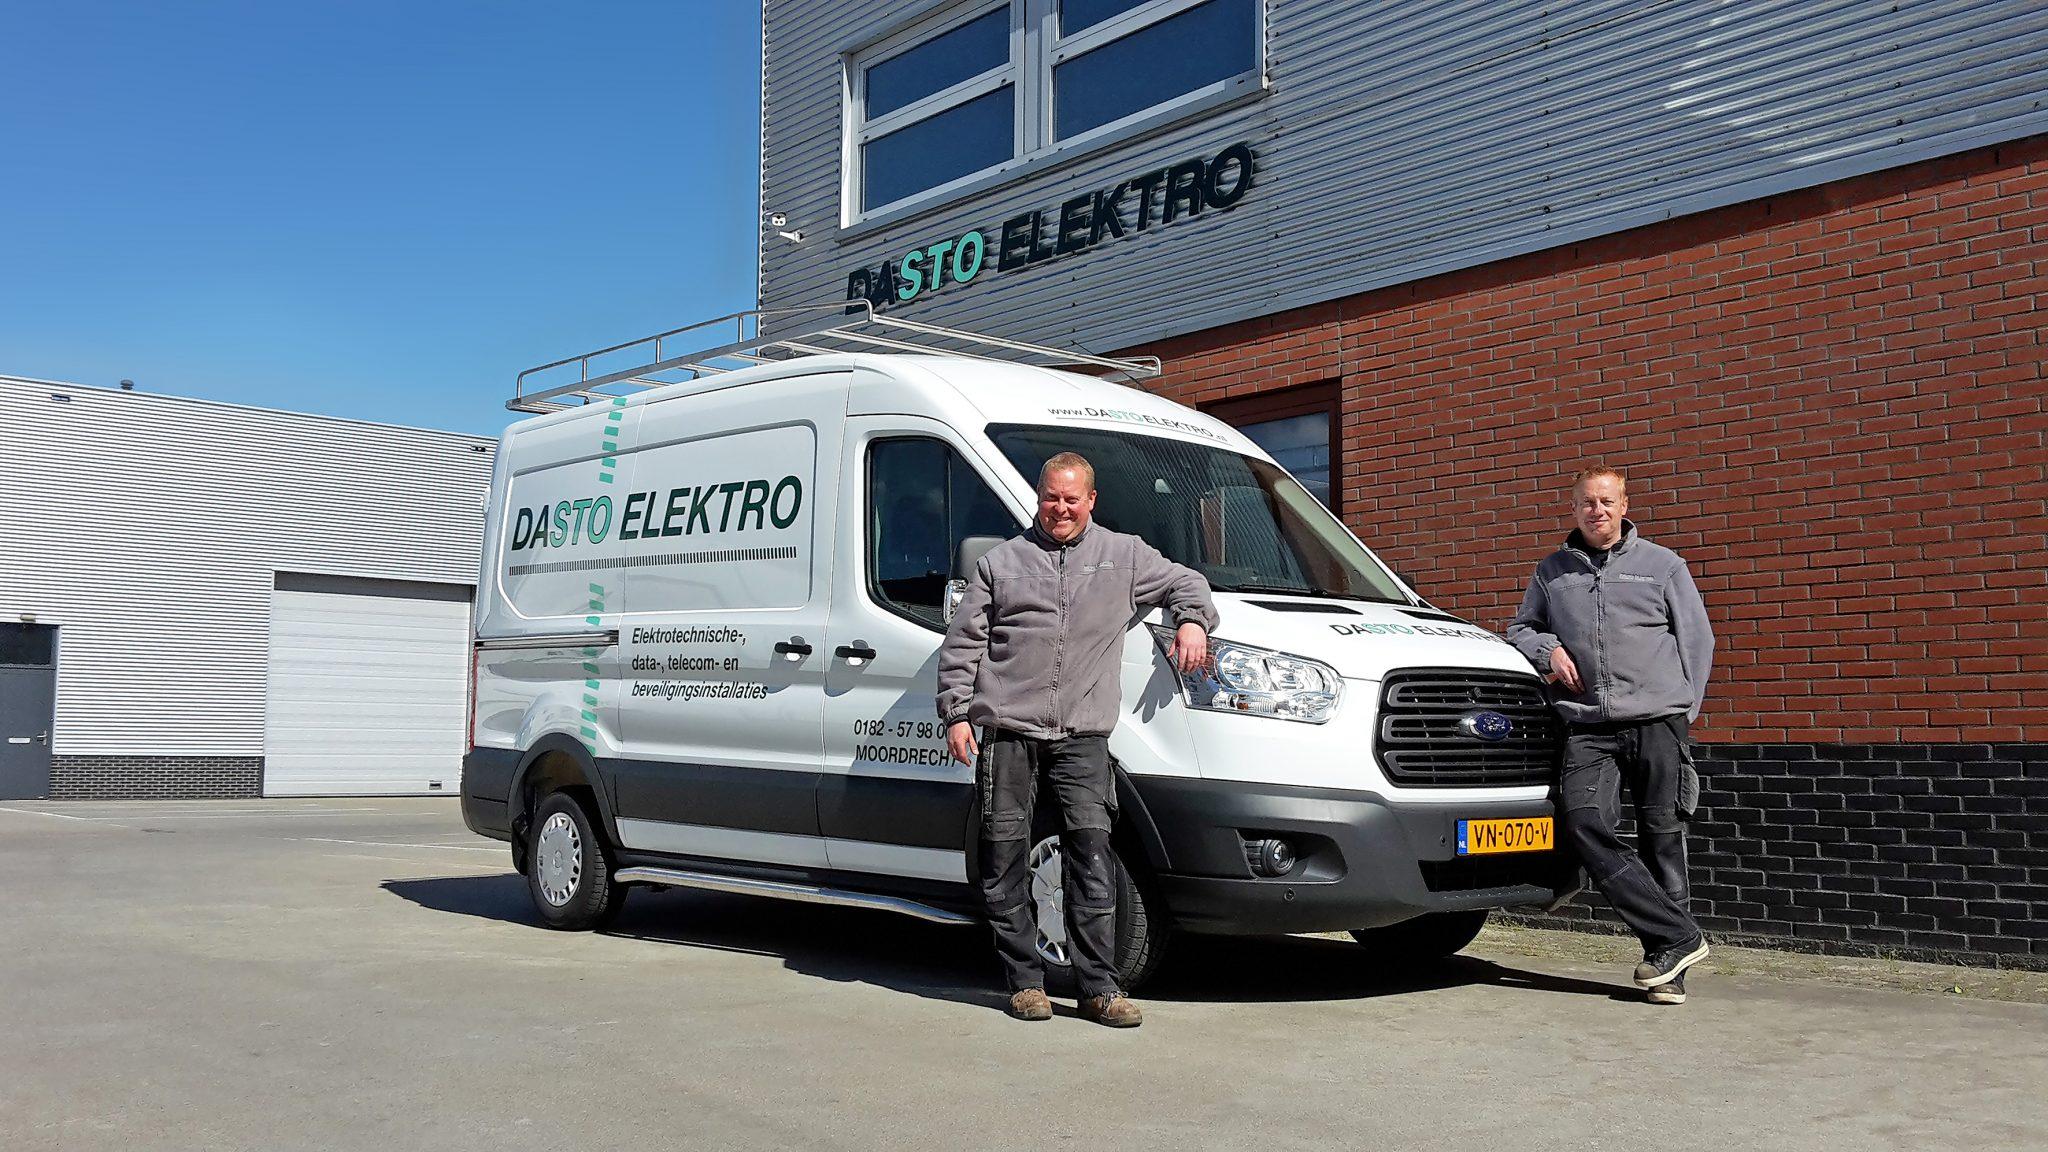 Sponsor belicht: Dasto Elektro